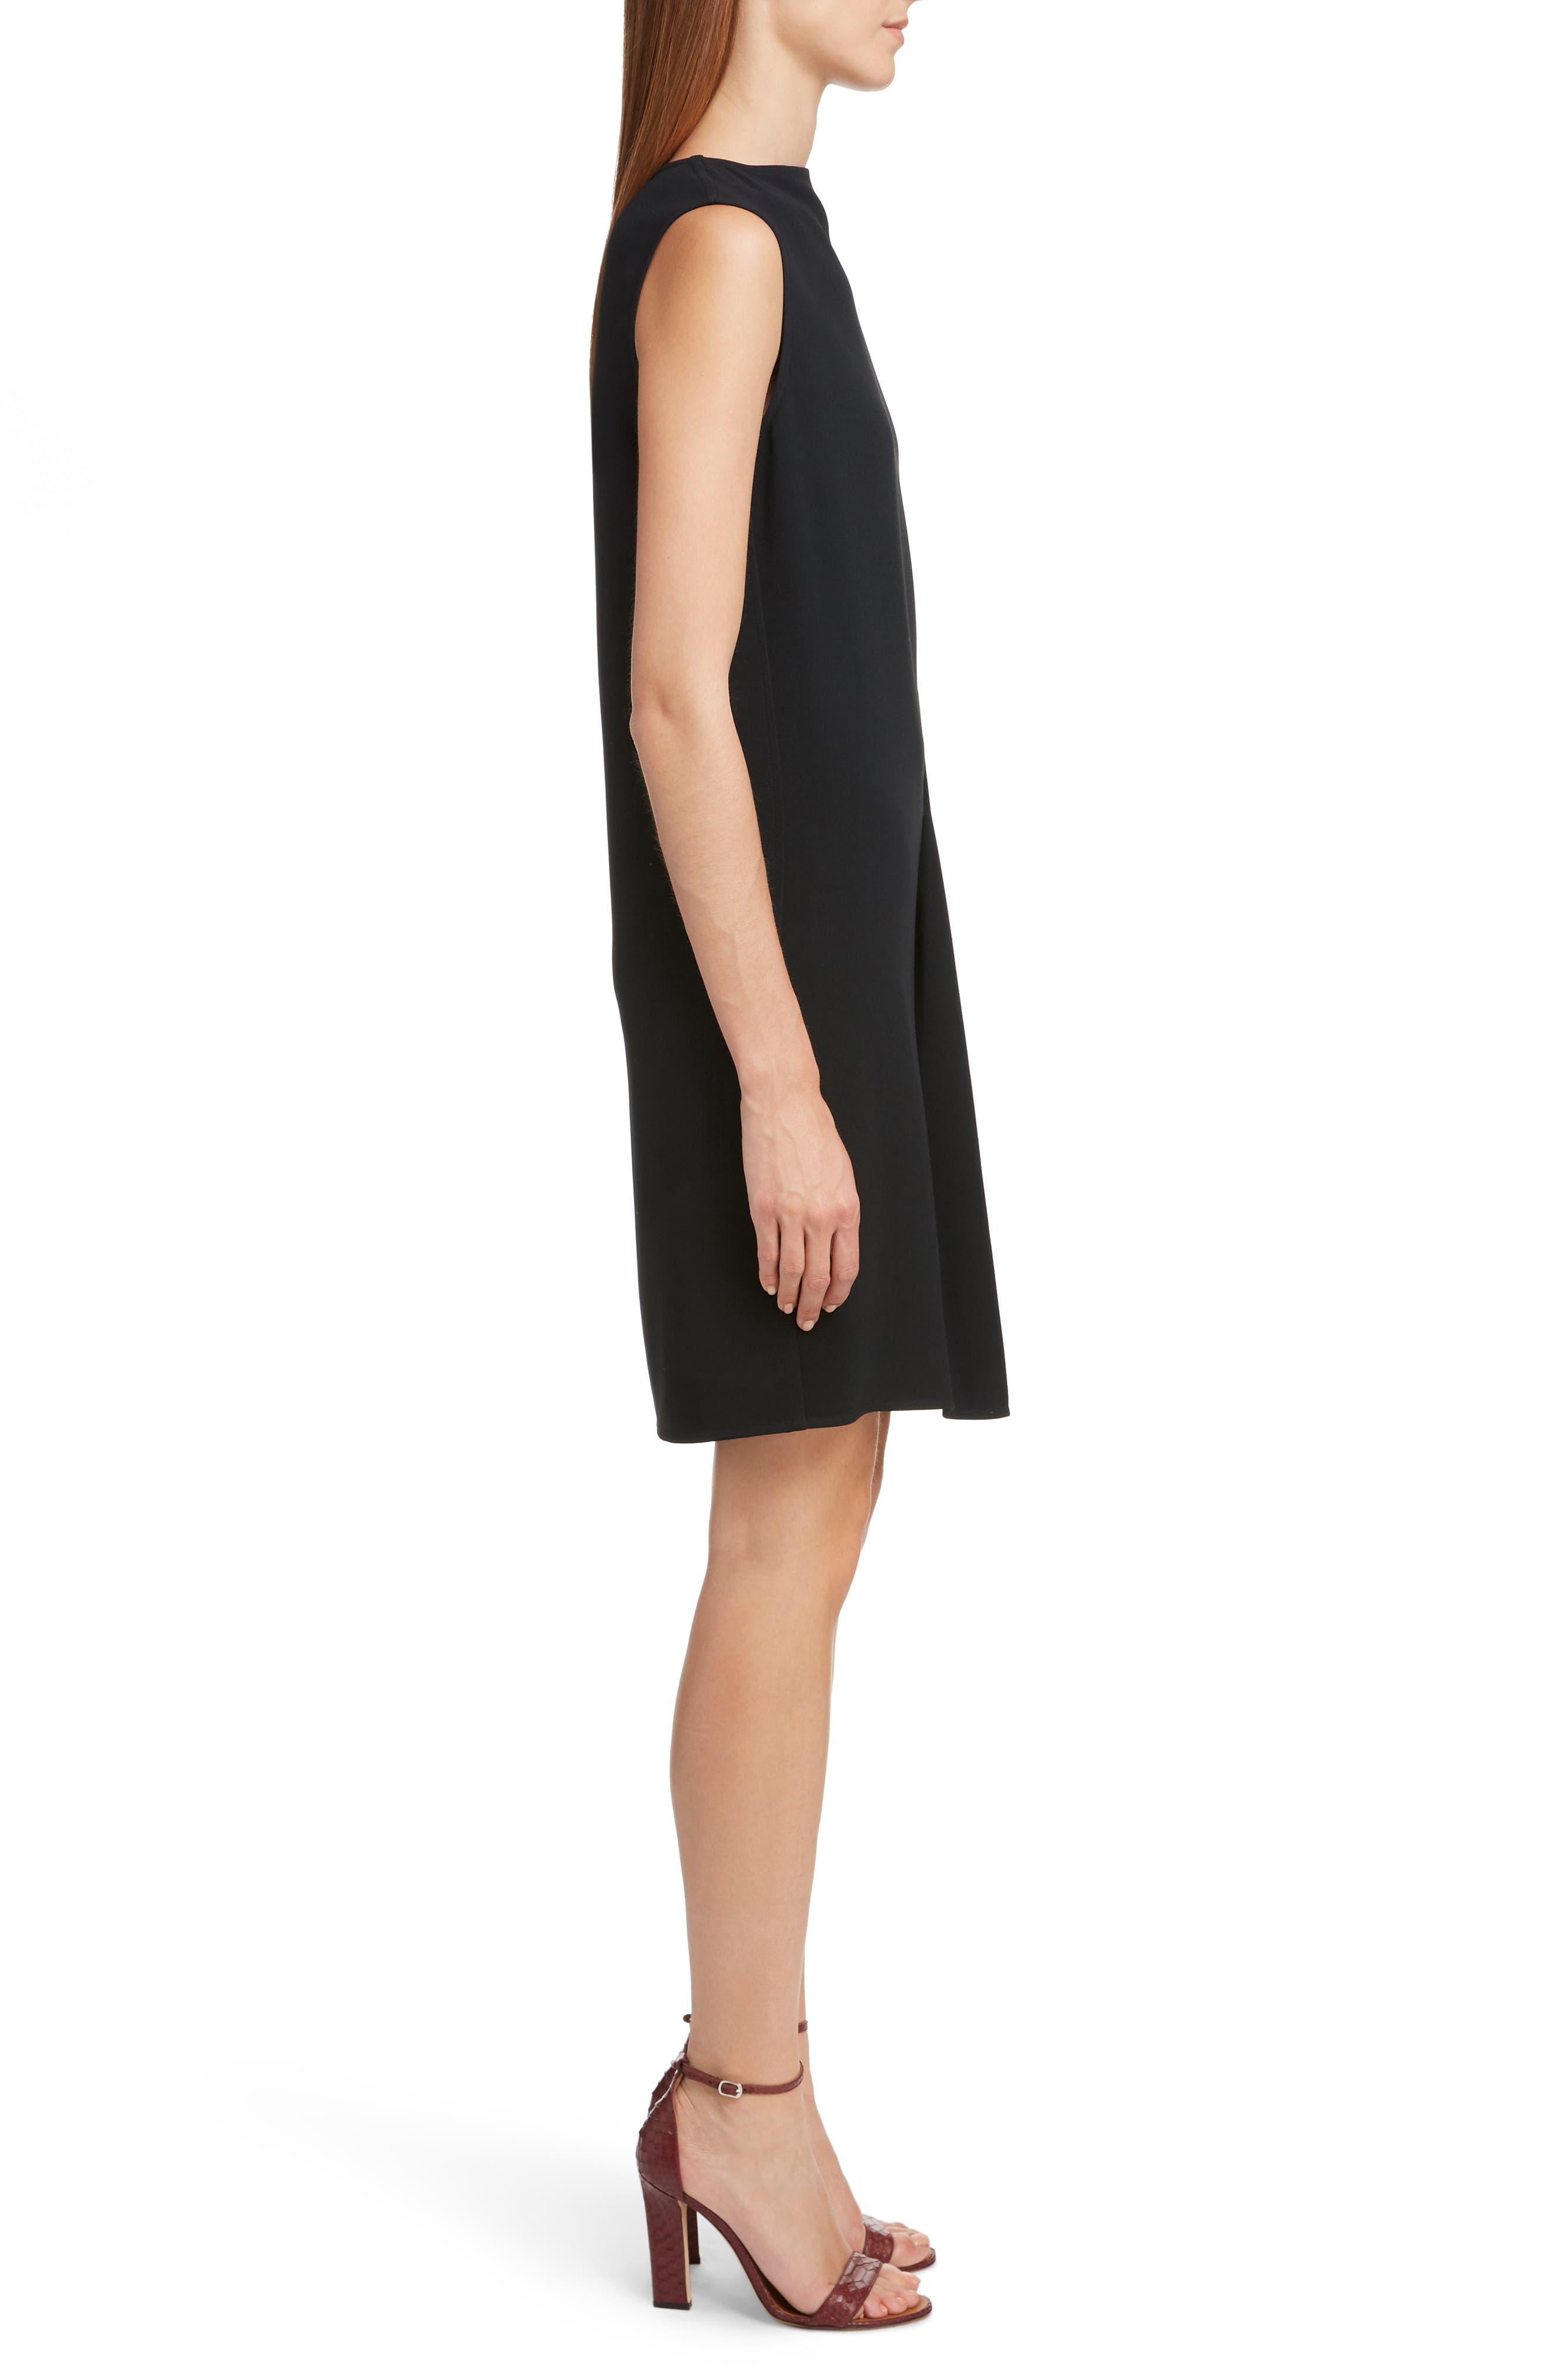 VICTORIA BECKHAM, Asymmetrical Pleat Shift Dress, Alternate thumbnail 3, color, BLACK